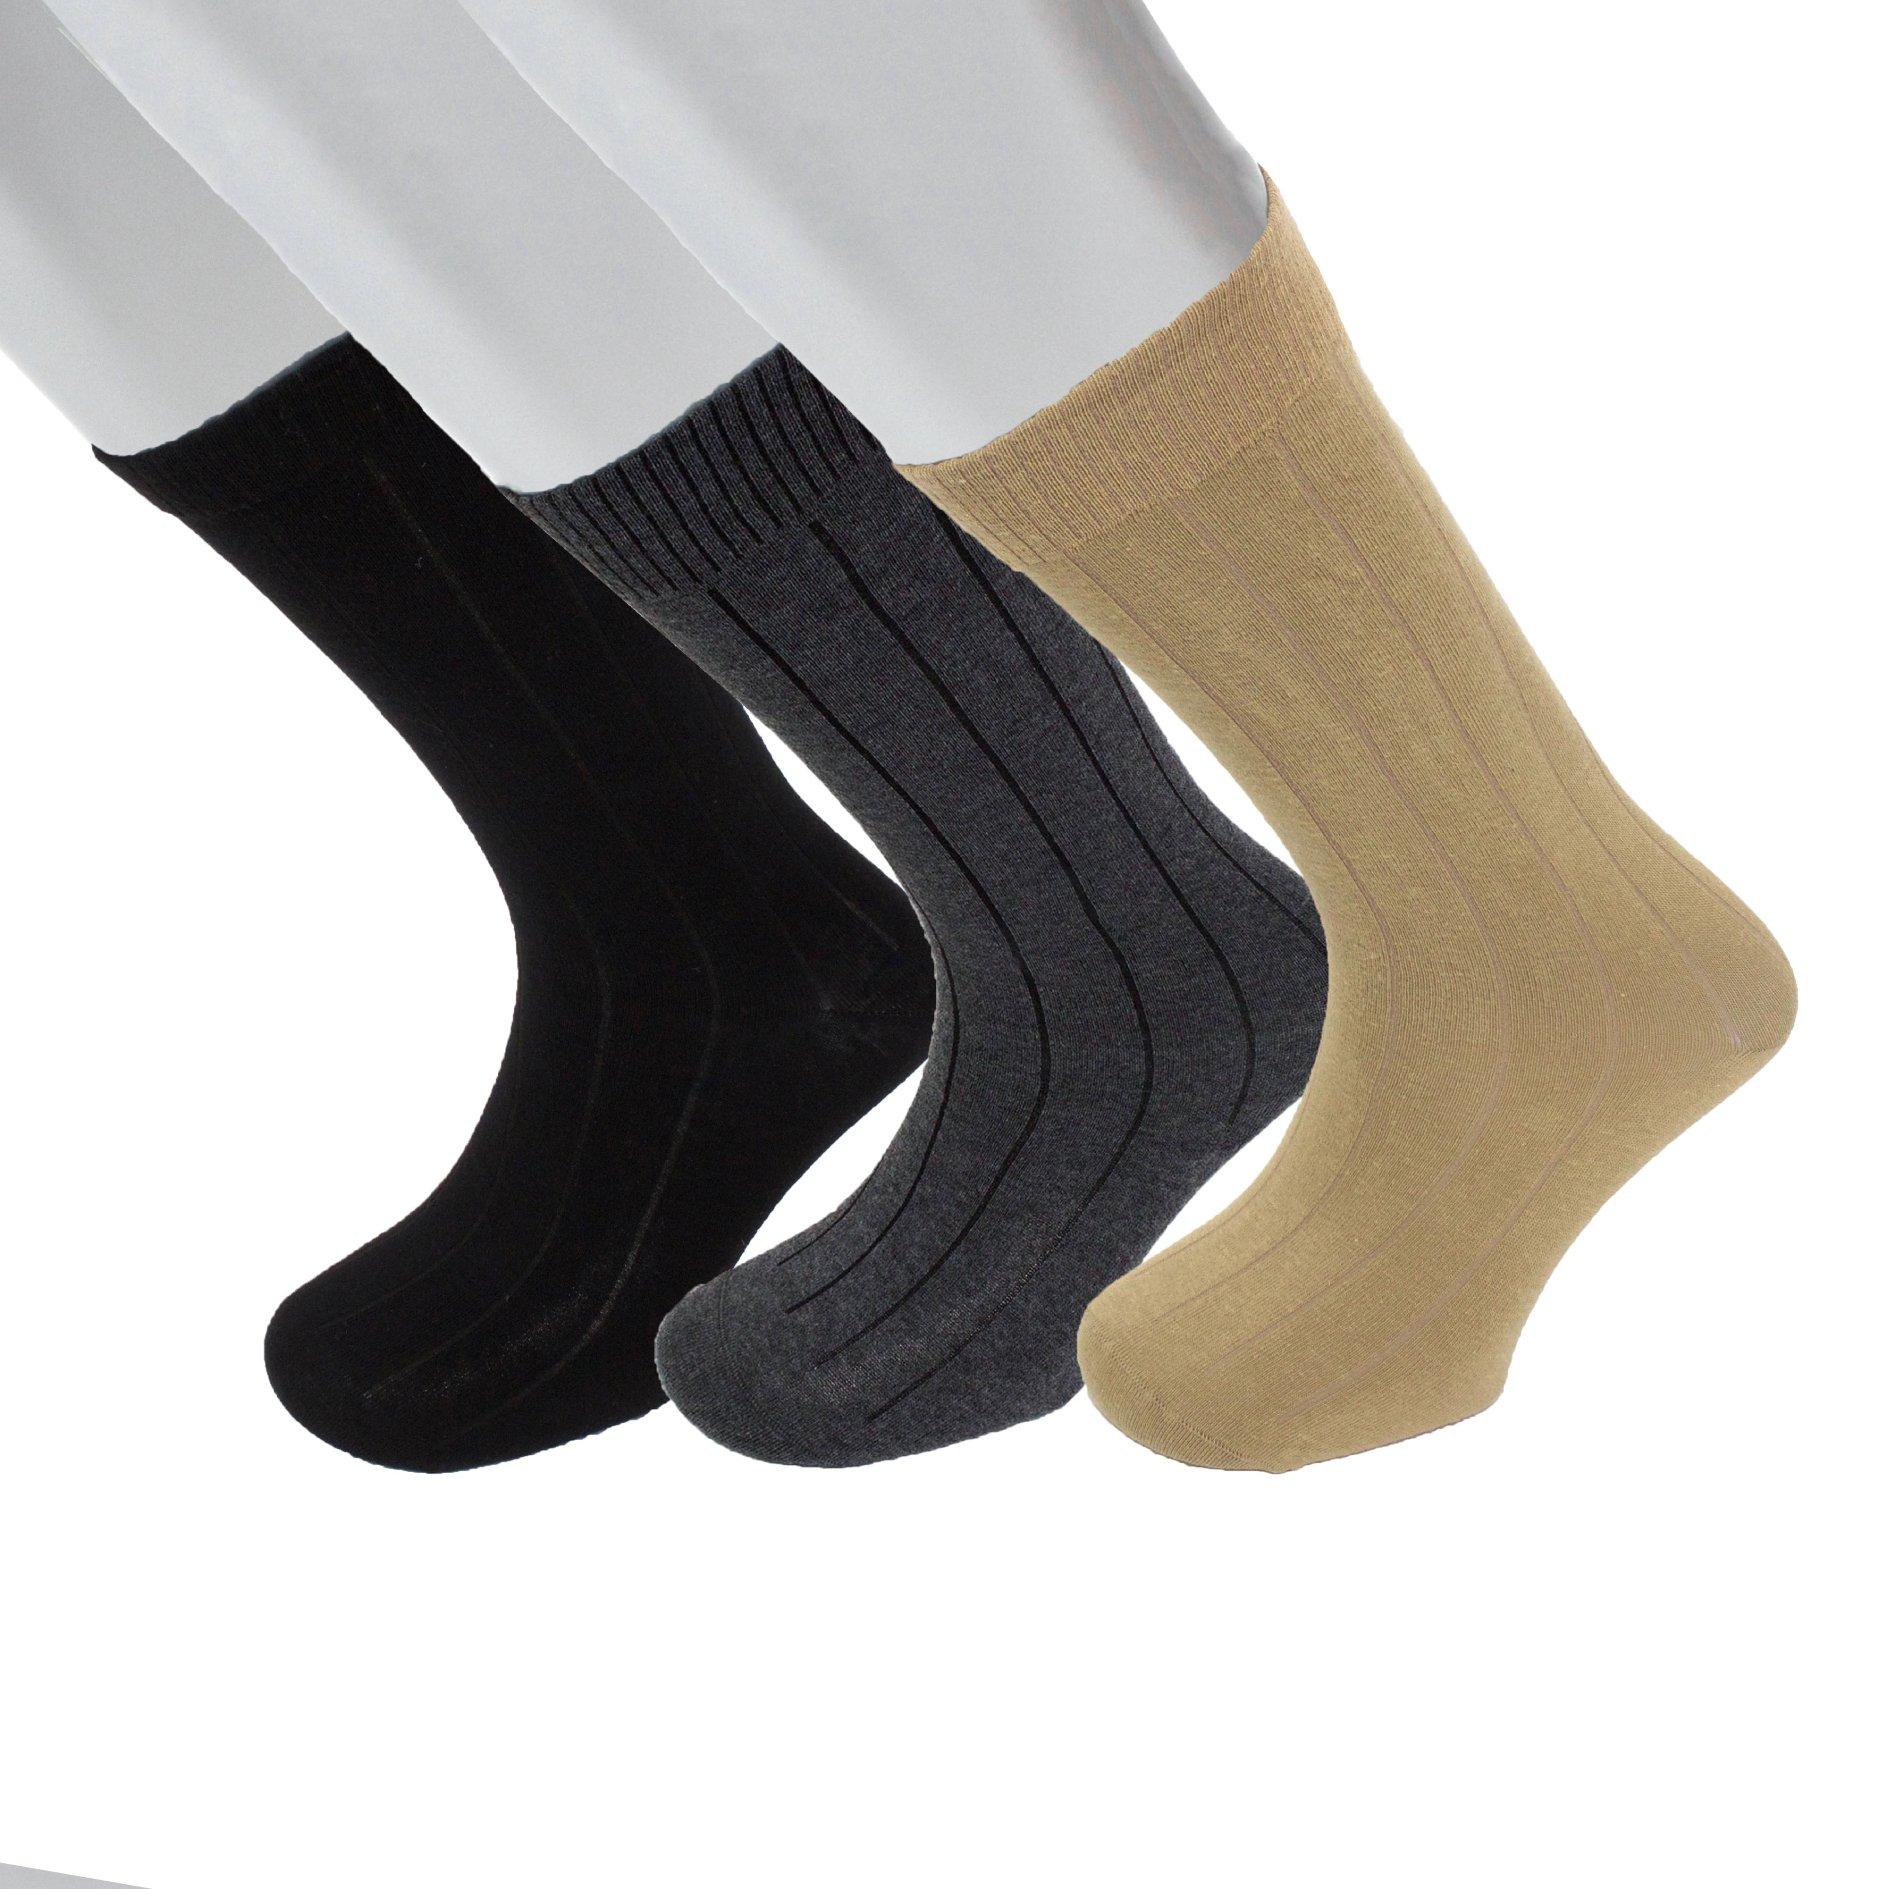 Diabetic Socks | Mens Black/Ch Grey/Khaki Mid-Calf Ribbed Assorted 3 Pack | Seamless Toe Size 10-13